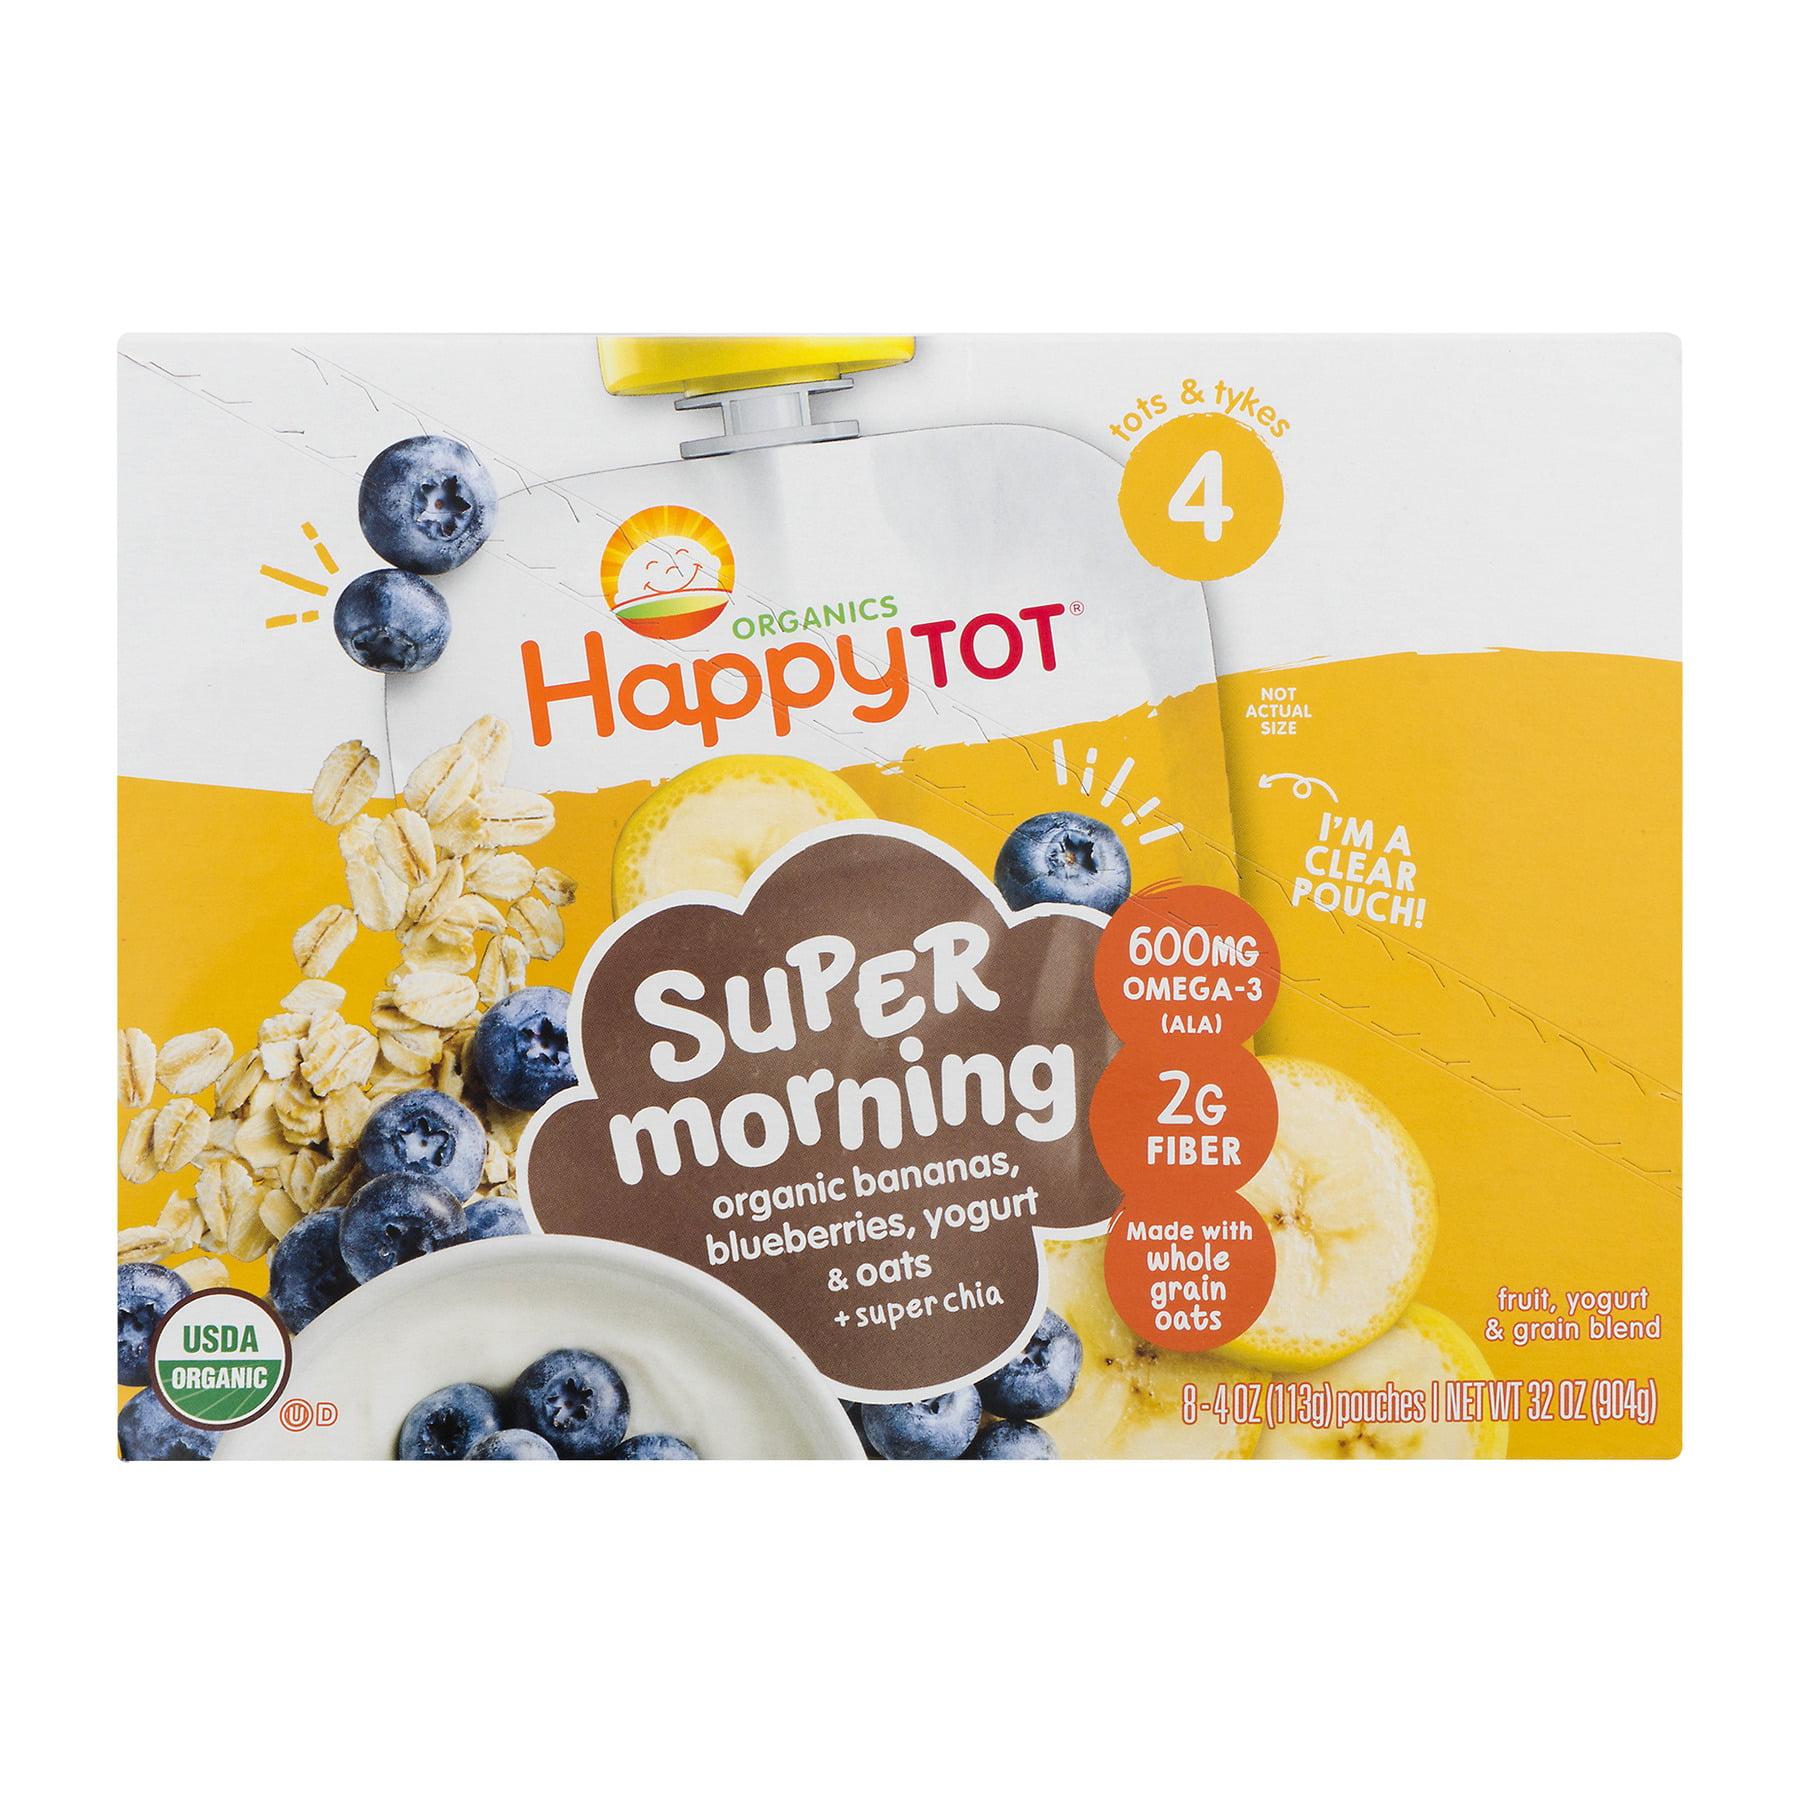 (8 Count) Happy Tot Organics Super Morning Bananas, Blueberries, Yogurt & Oats + Super Chia Organic Stage 4 Baby Food, 4 oz